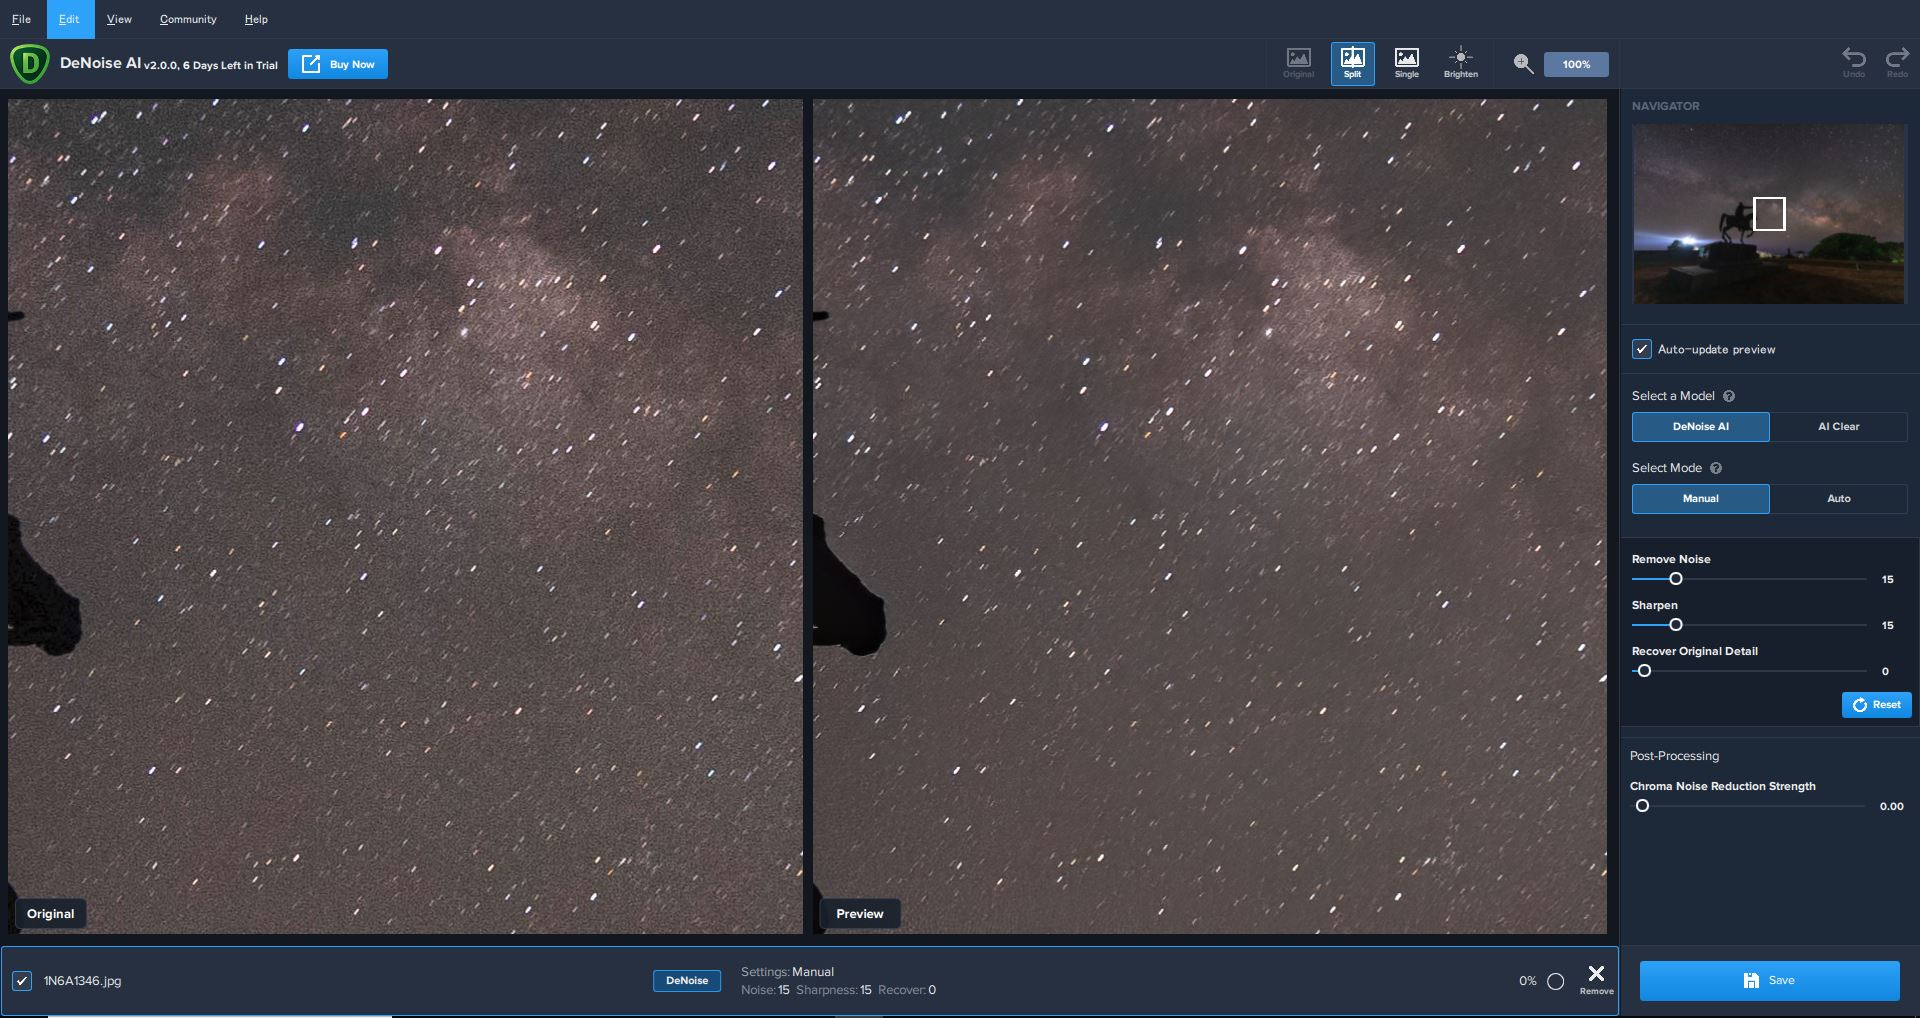 topaz Denoise Aiと星景写真